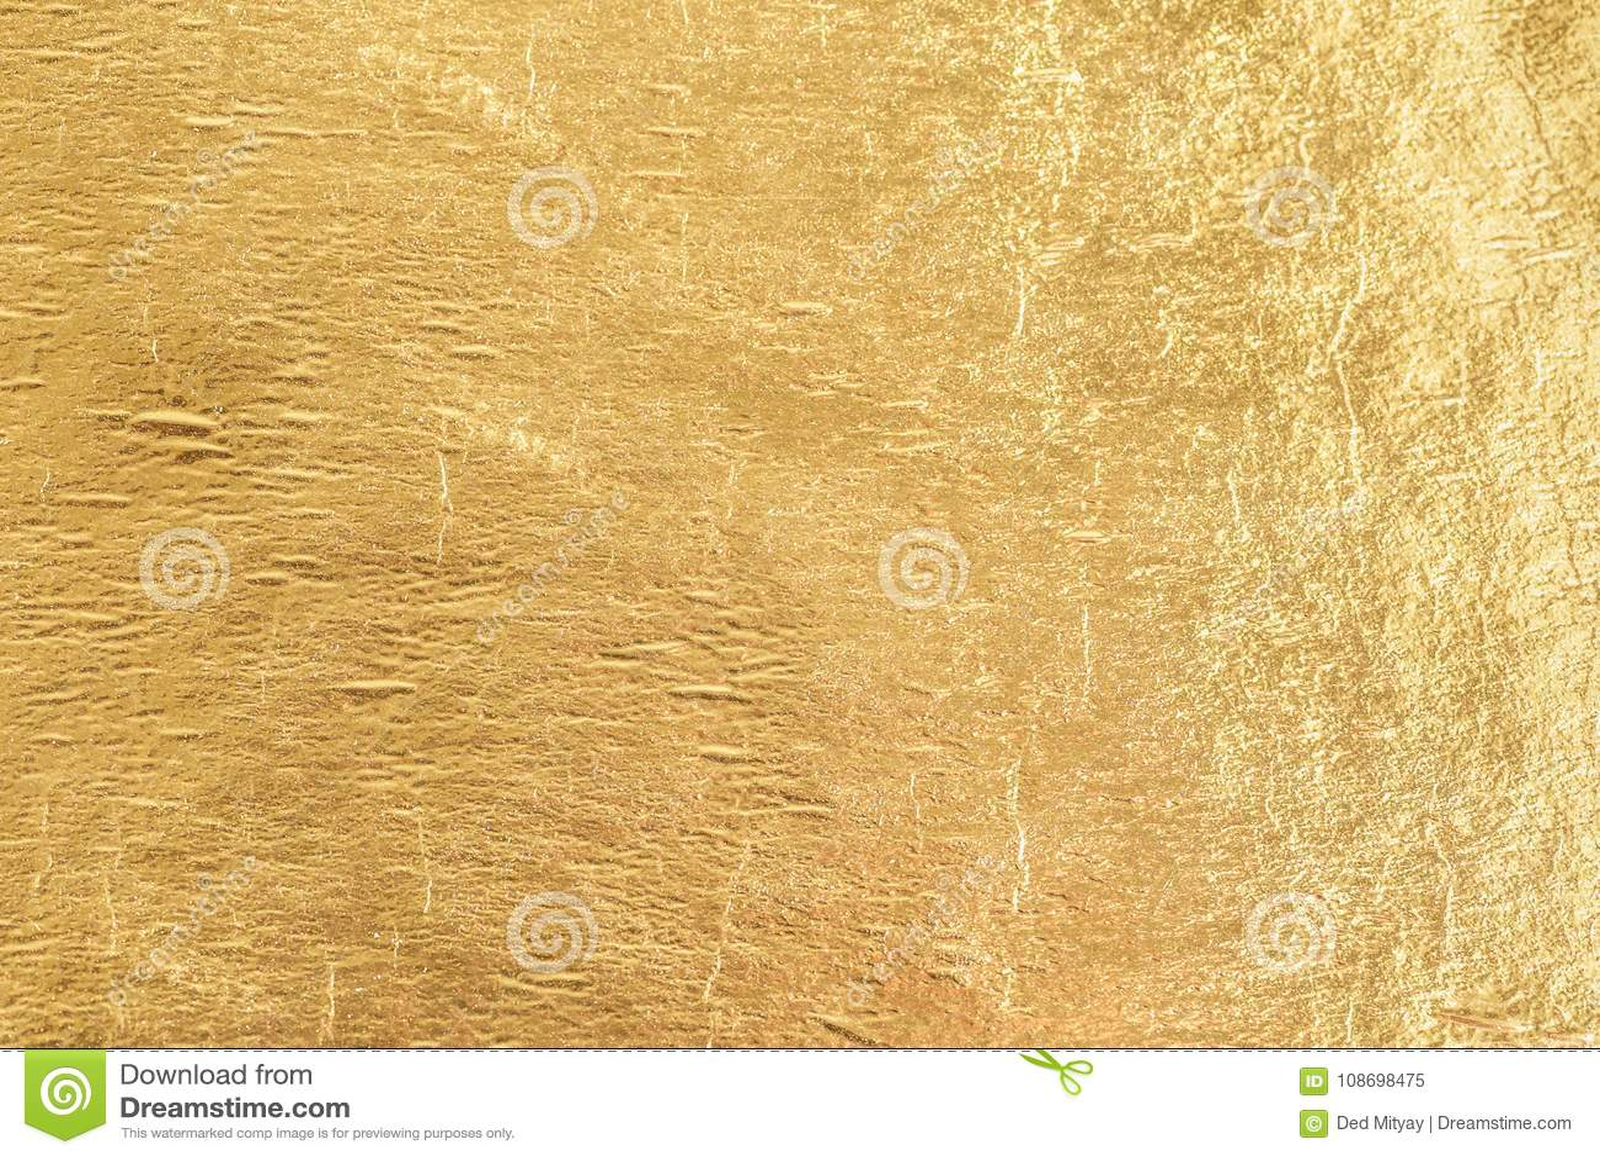 Gold shiny foil background, yellow gloss metallic texture